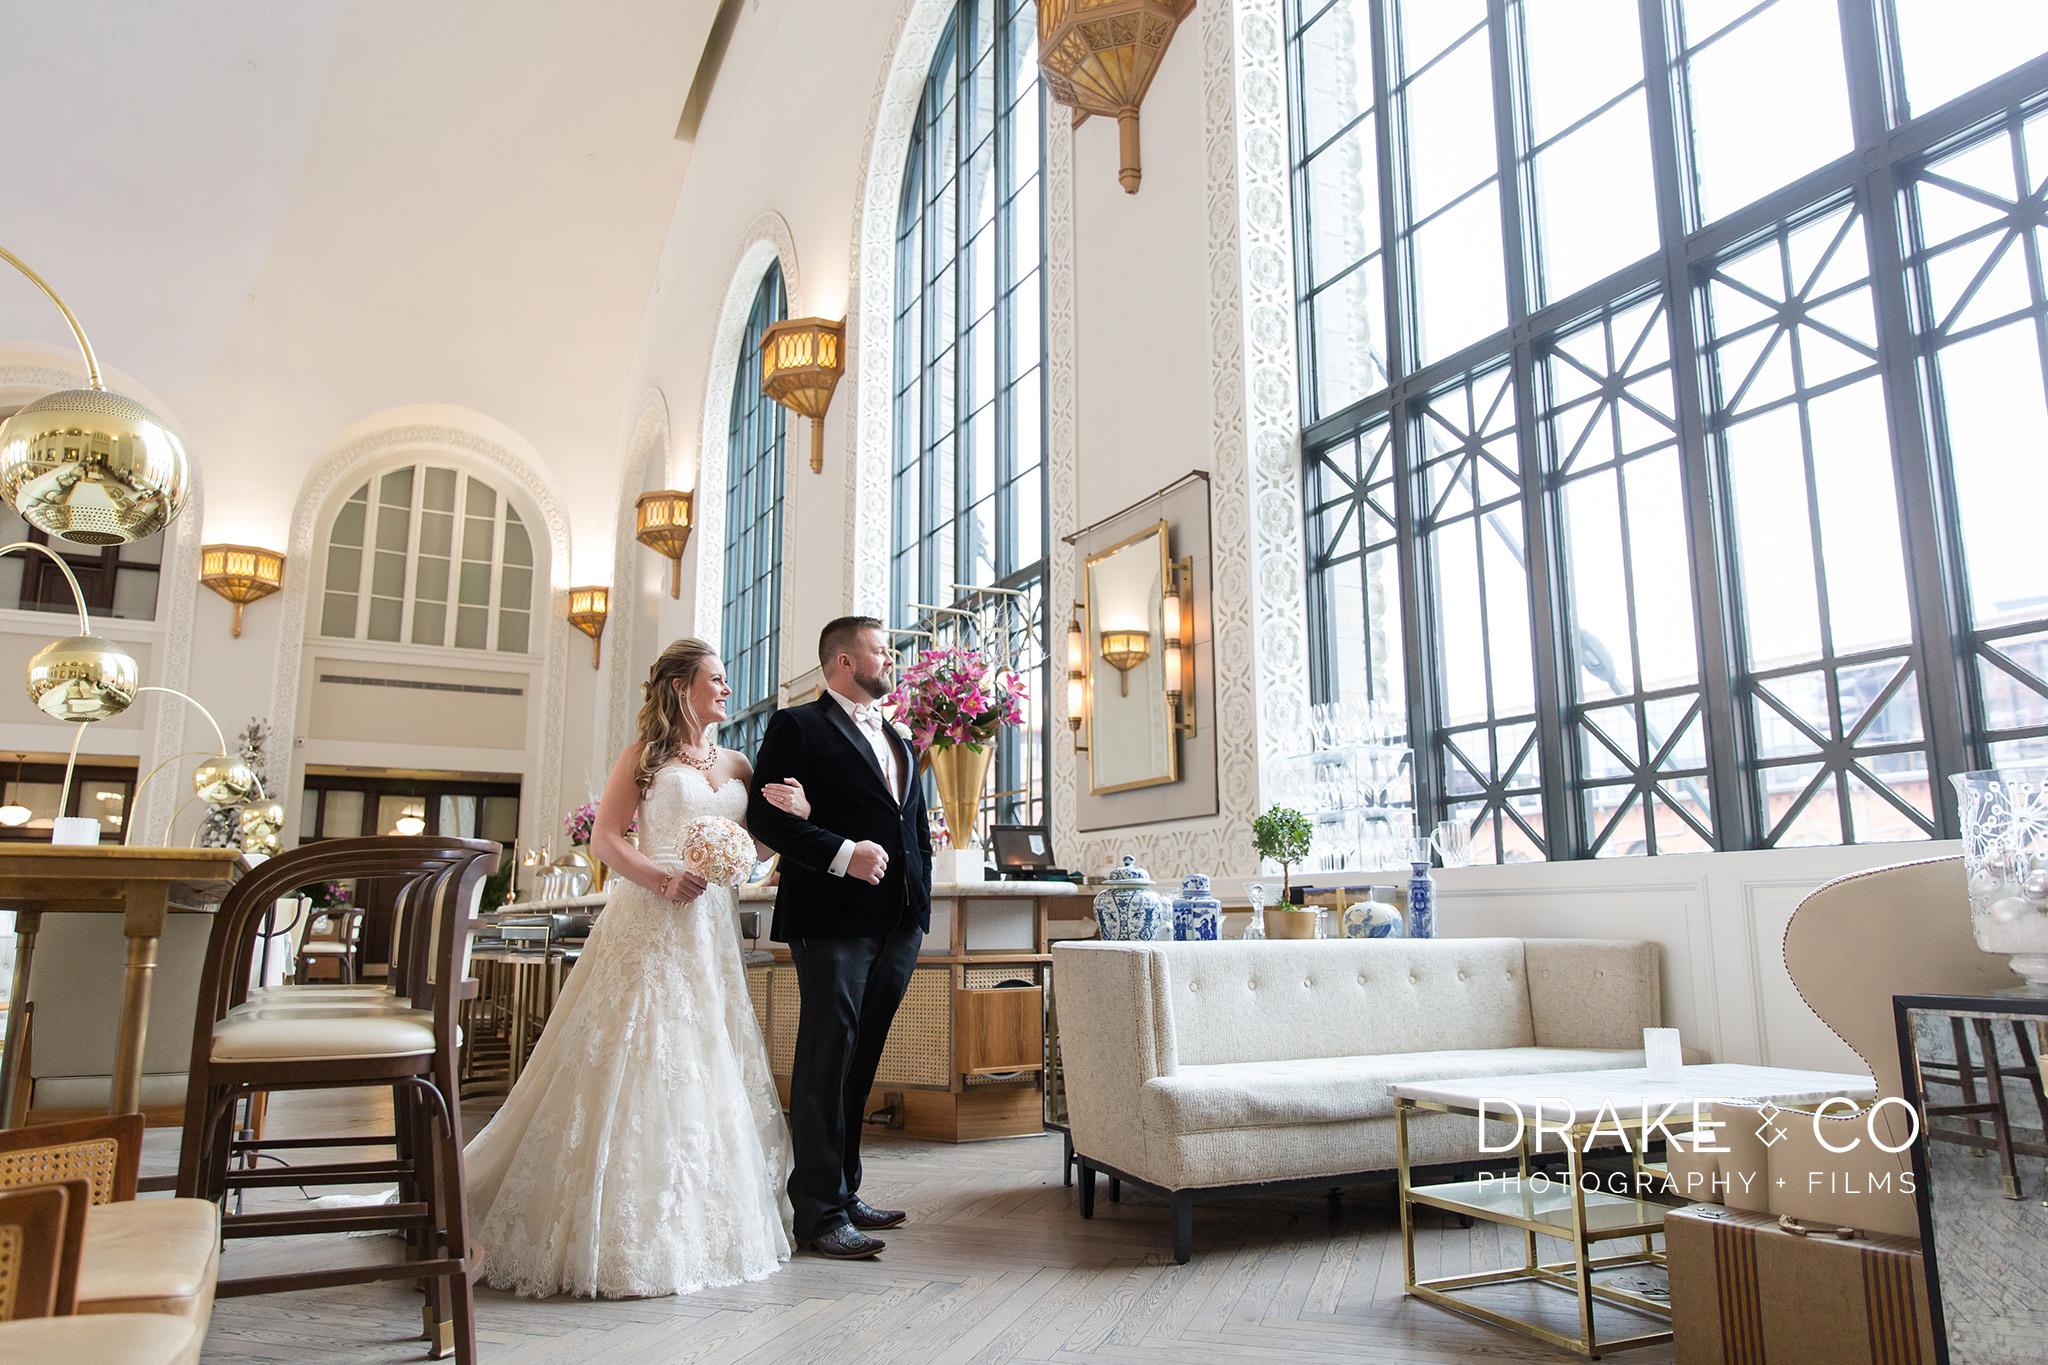 0424- Kara and Brandon's Wedding Photos.jpg